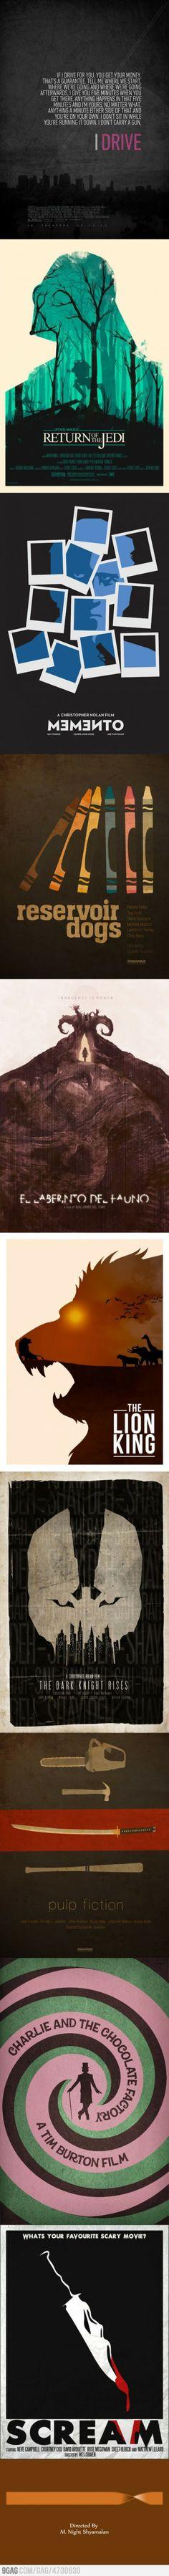 Minimalistic movie posters. Favorites: Drive, Memento, & Pan's Labyrinth (Labarintho del Fauno).